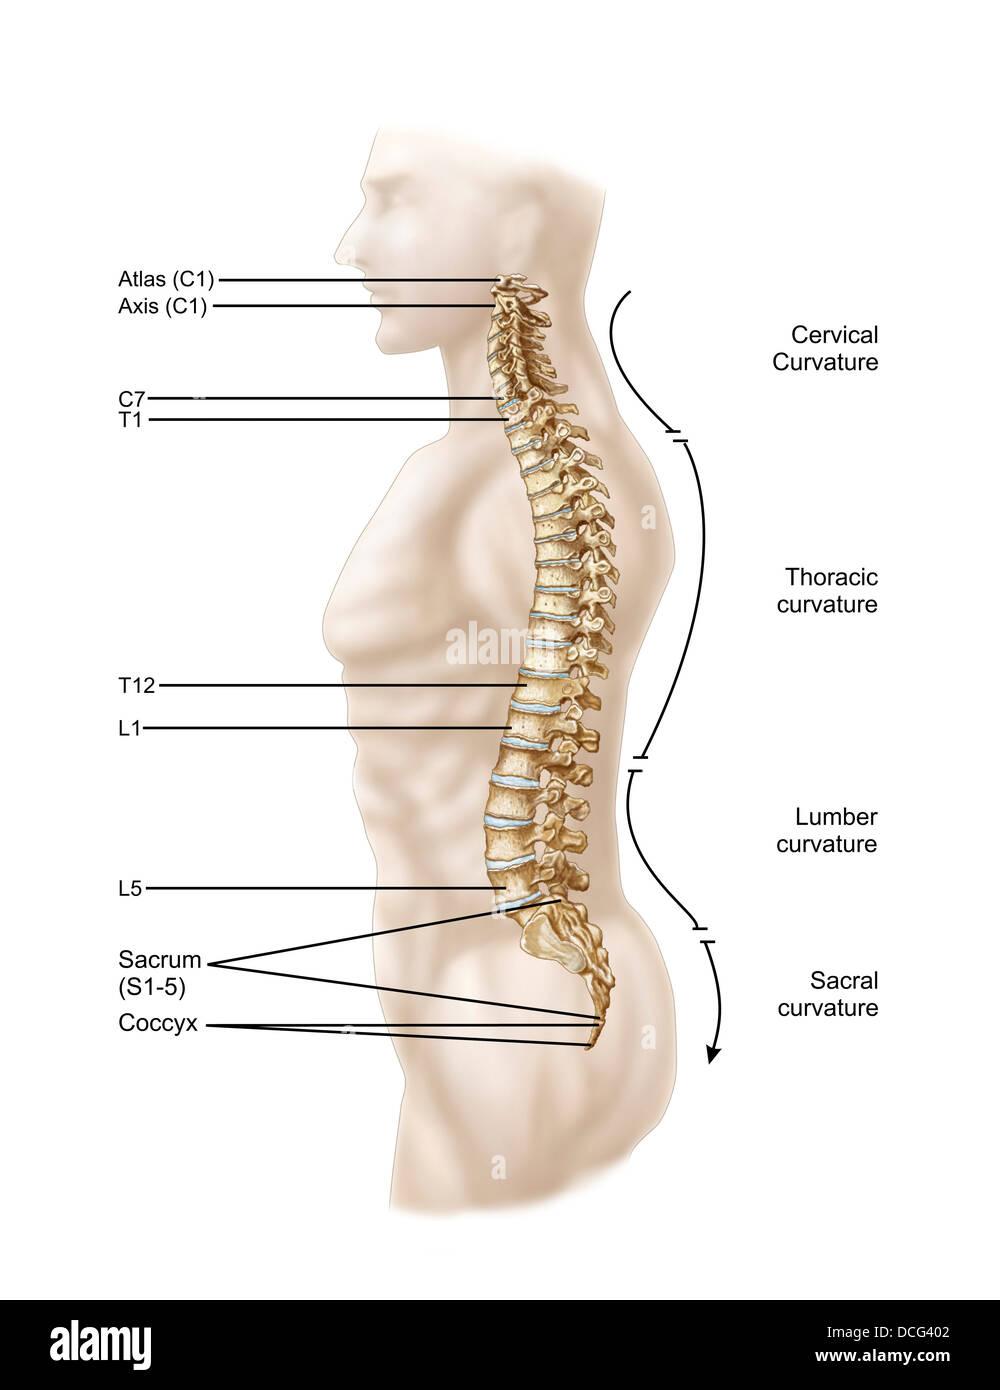 parts of the human skull diagram 1972 chevelle alternator wiring anatomy vertebral column, left lateral view stock photo: 59361346 - alamy